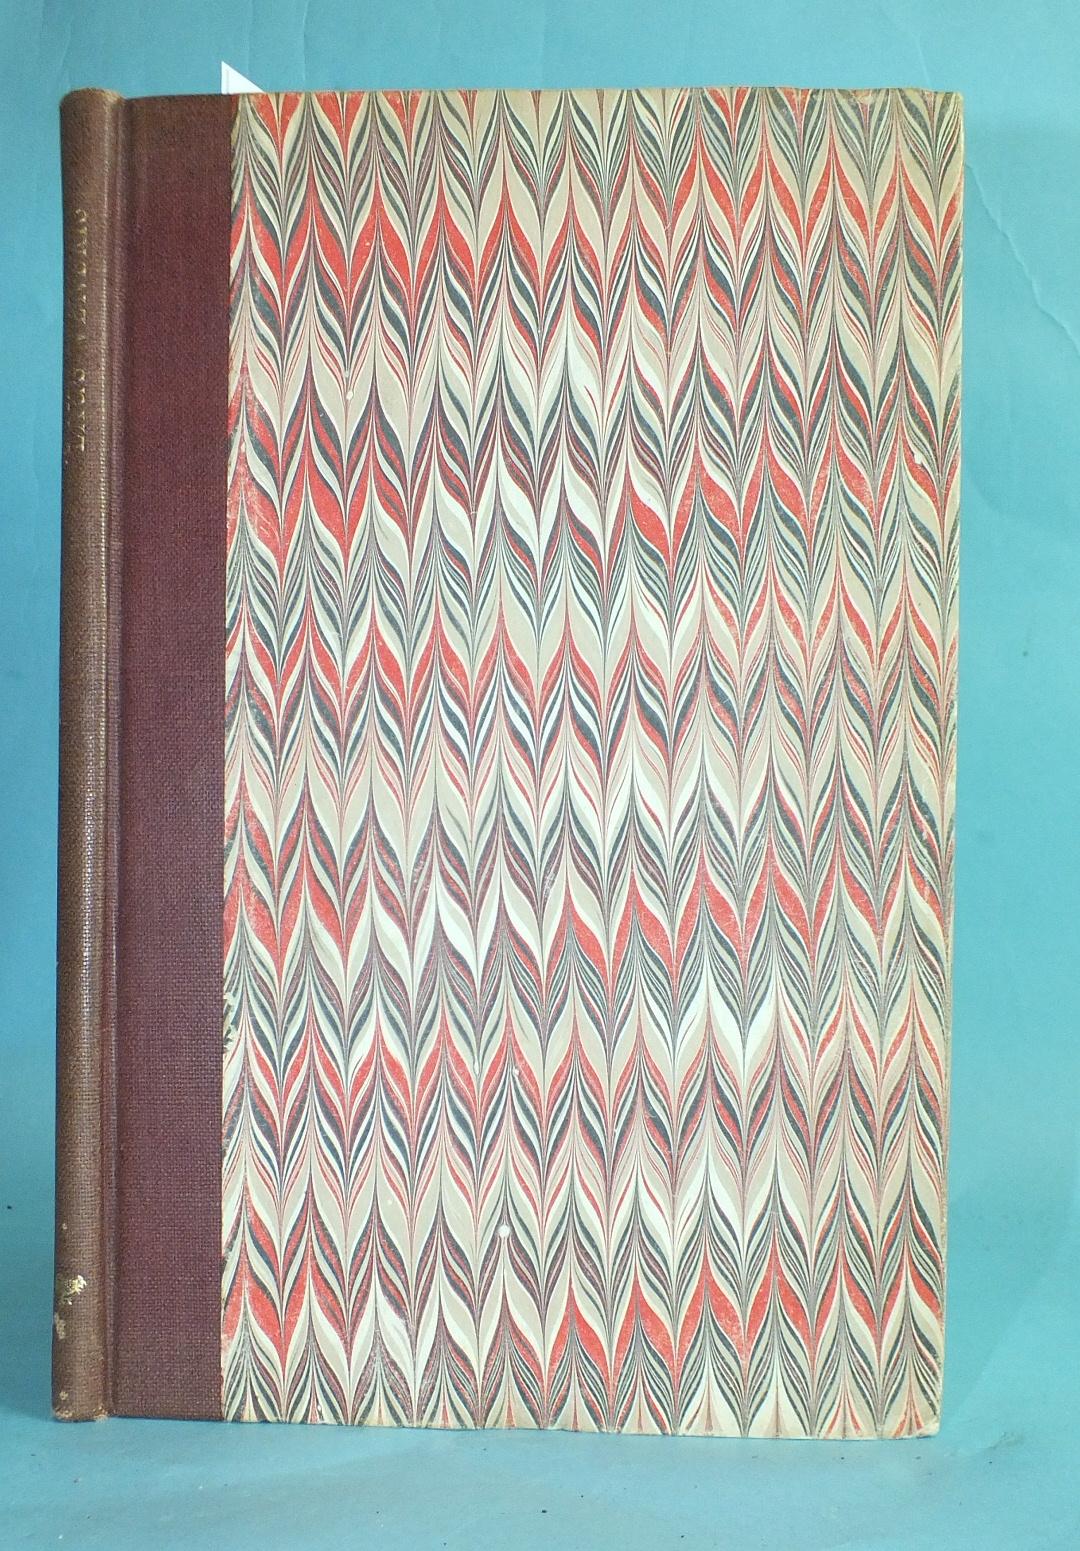 Golden Cockerel Press, Swinburne (Algernon Charles), Laus Veneris, wood engr tp and illus by John